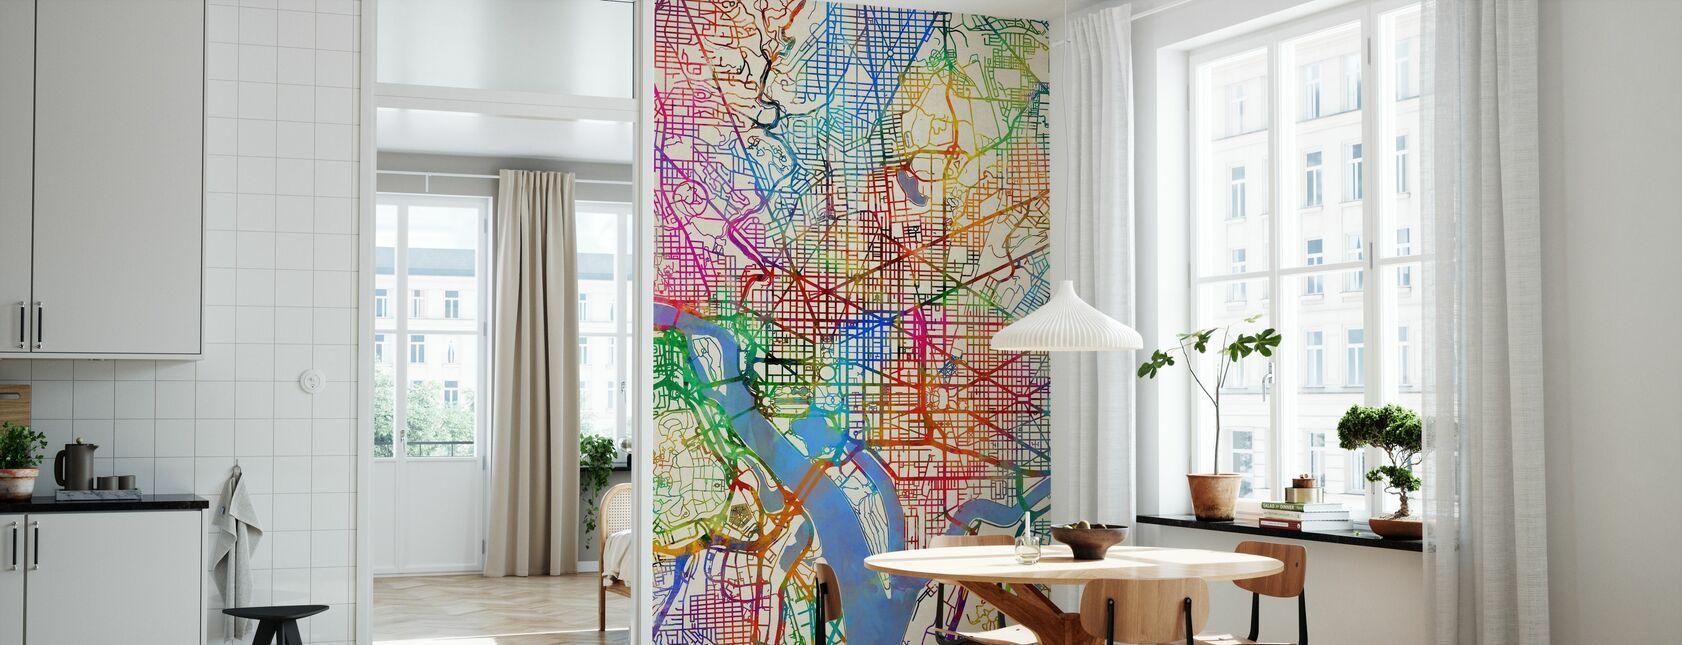 Washington DC Street Map - Wallpaper - Kitchen